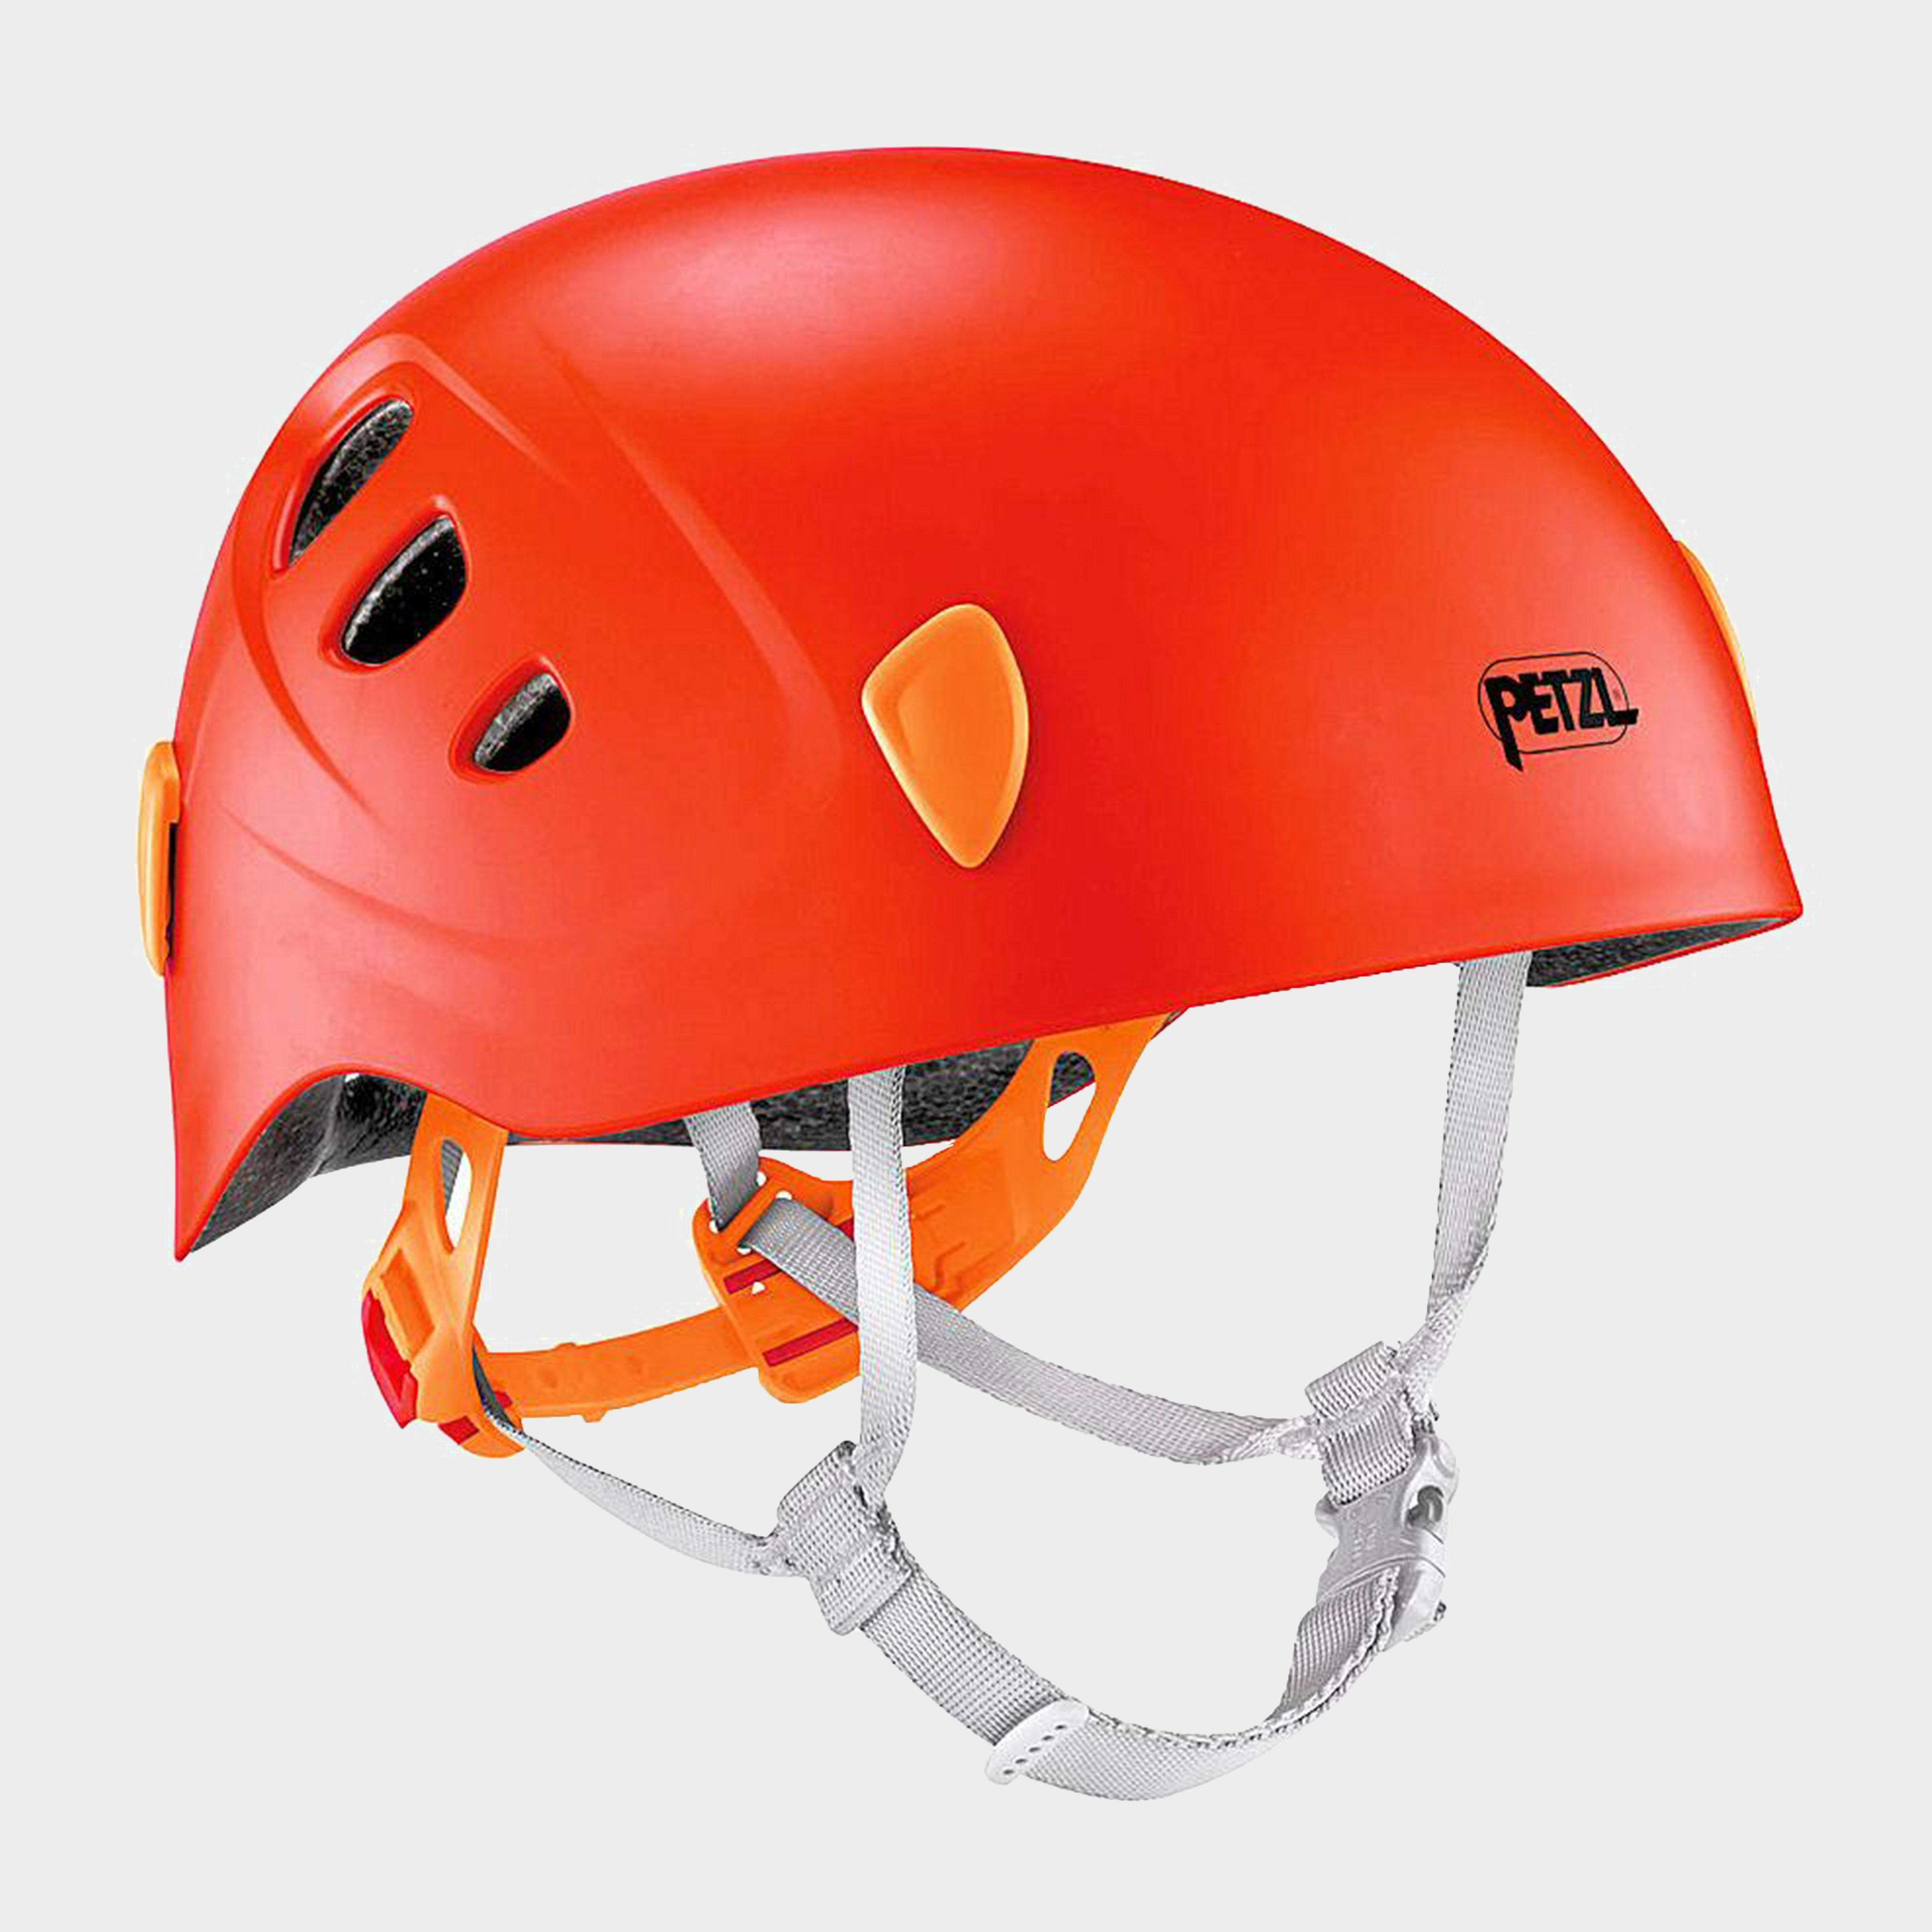 Petzl Petzl Kids Picchu Helmet - Red, Red